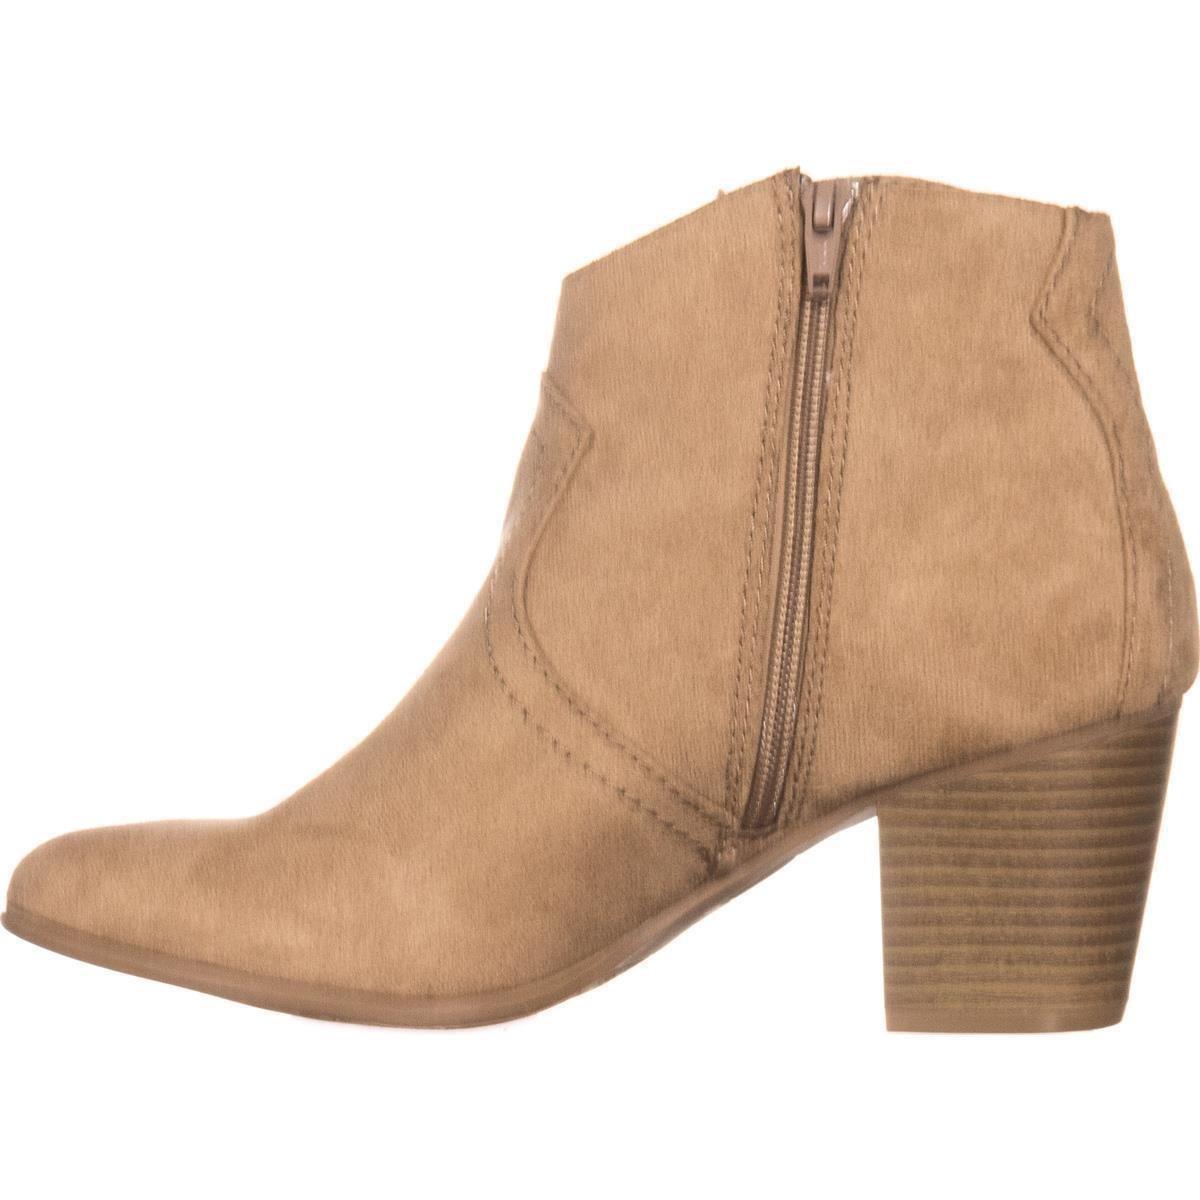 Toe American botas moda Almond Rylie tobillo para mujer Rag de xnxr17